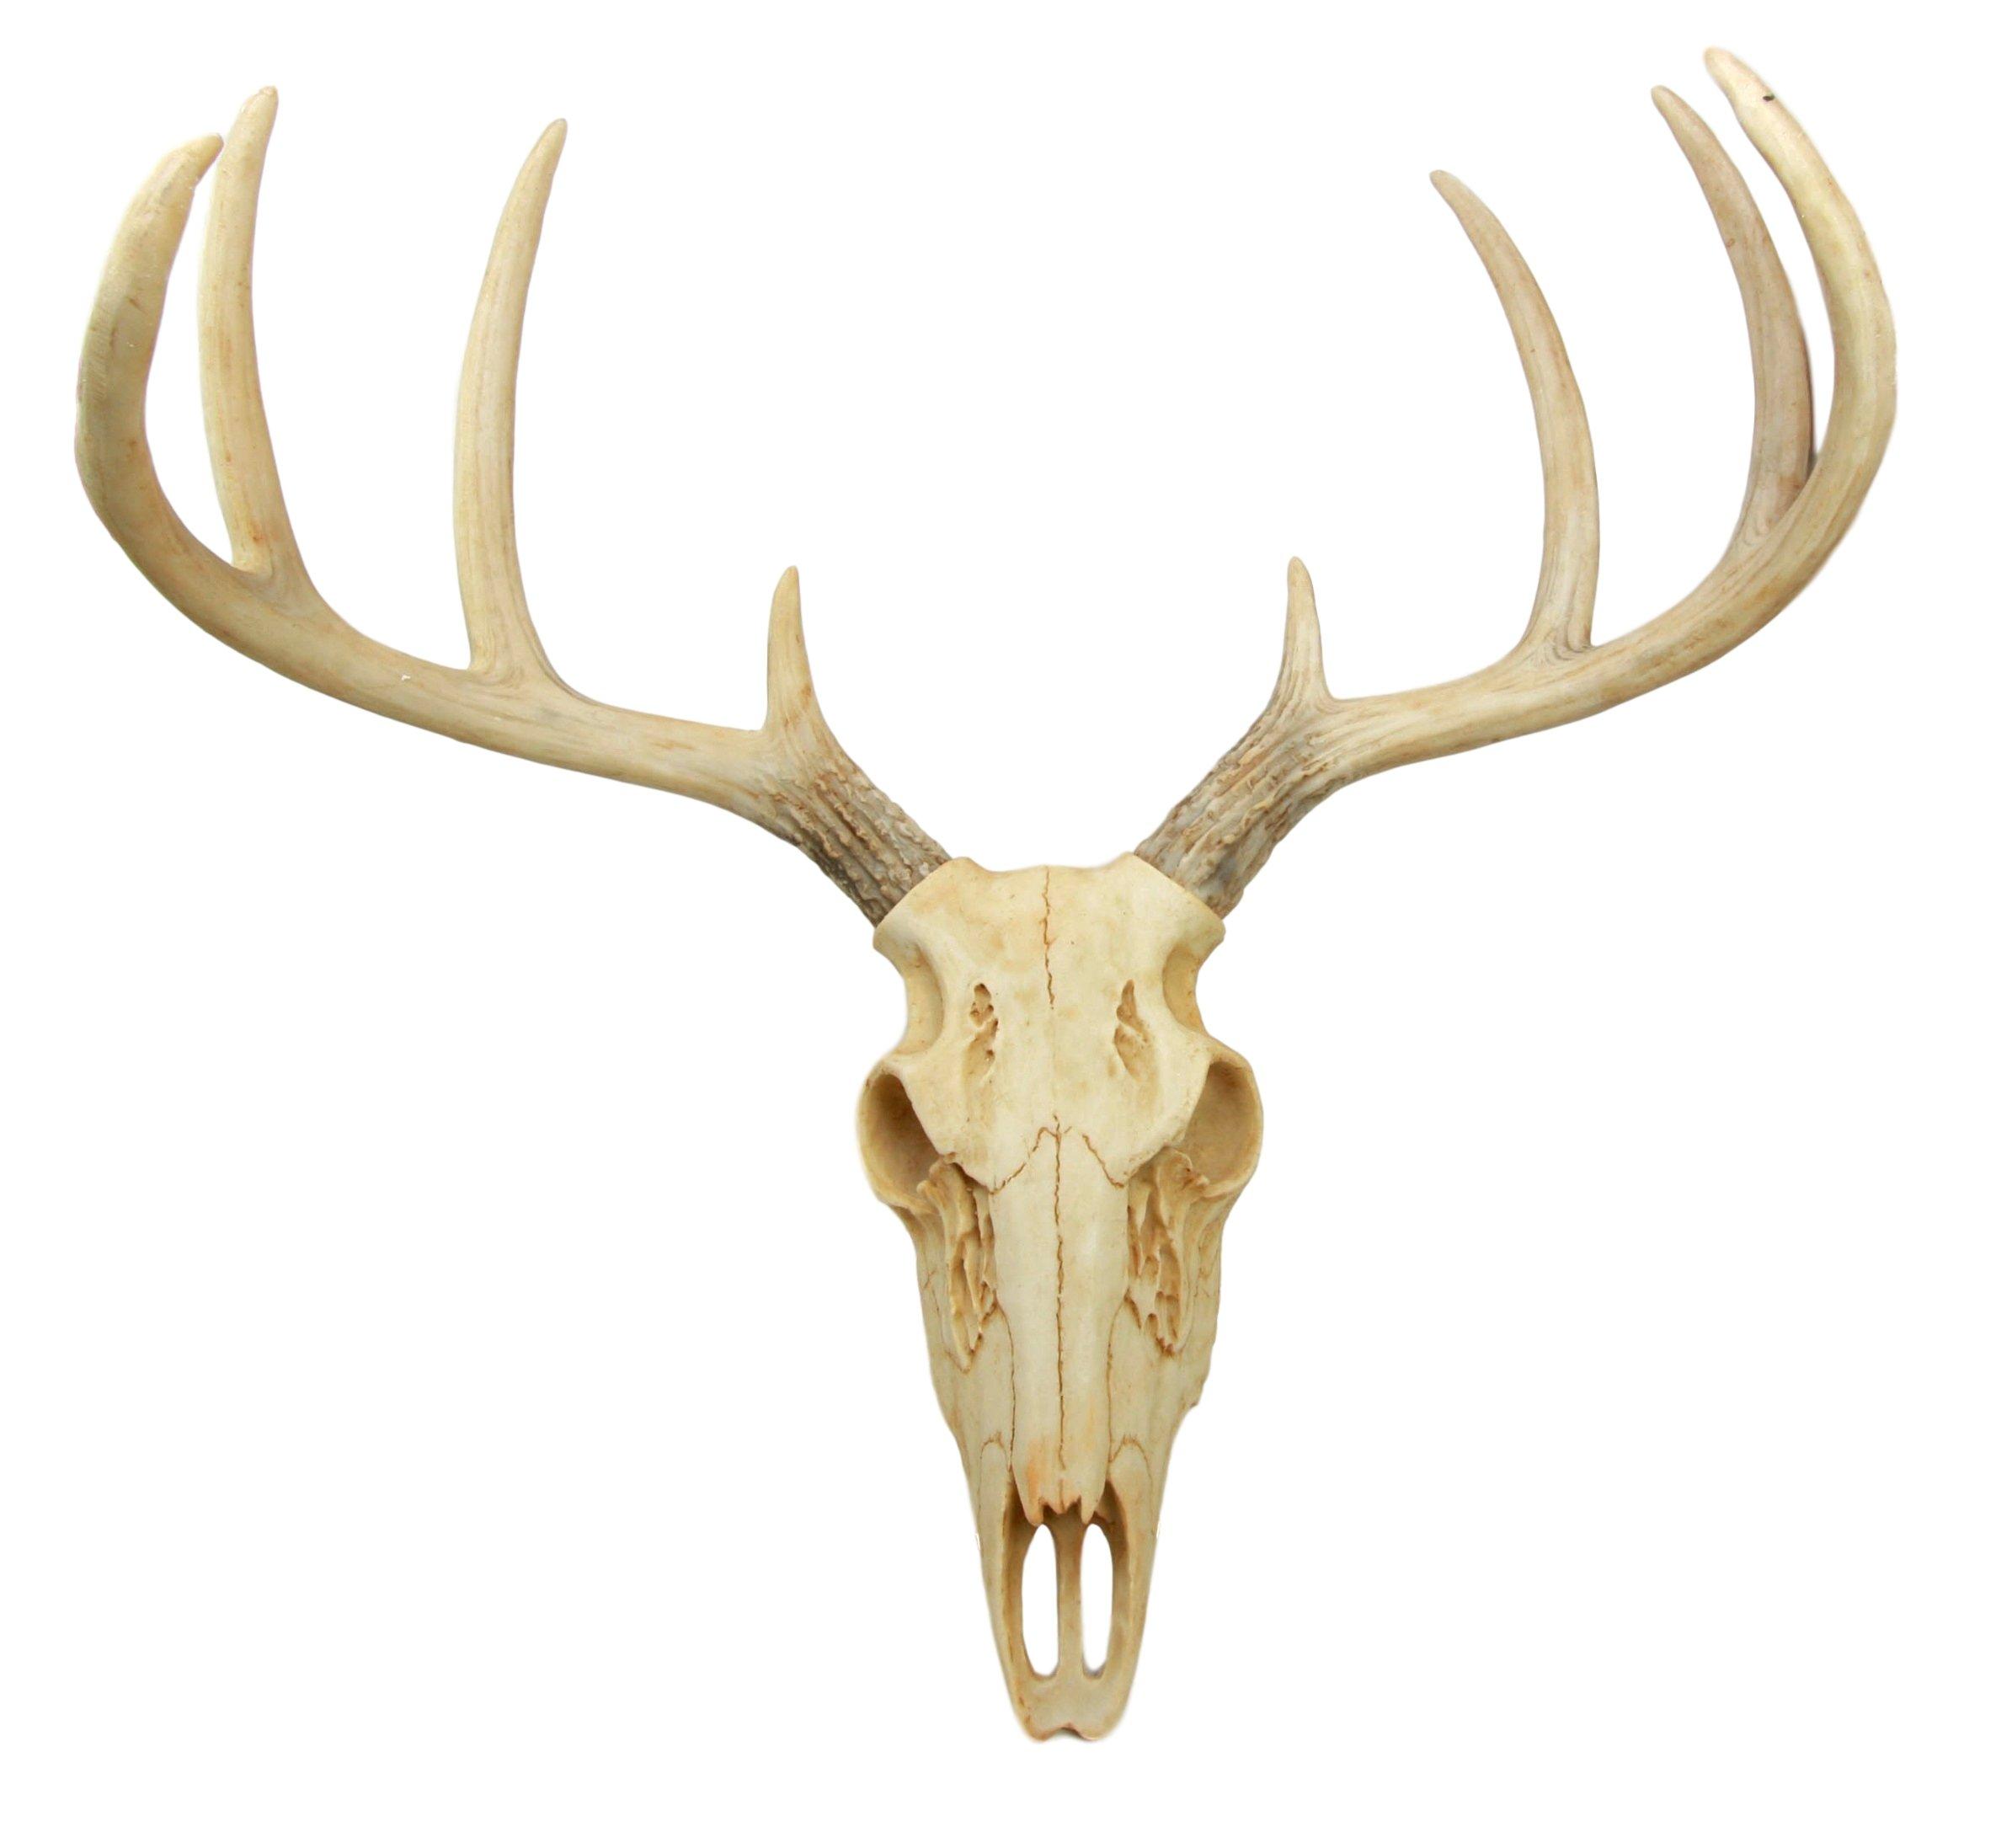 Atlantic Rustic Hunter Deer 8 Point Buck Skull Antler Rack